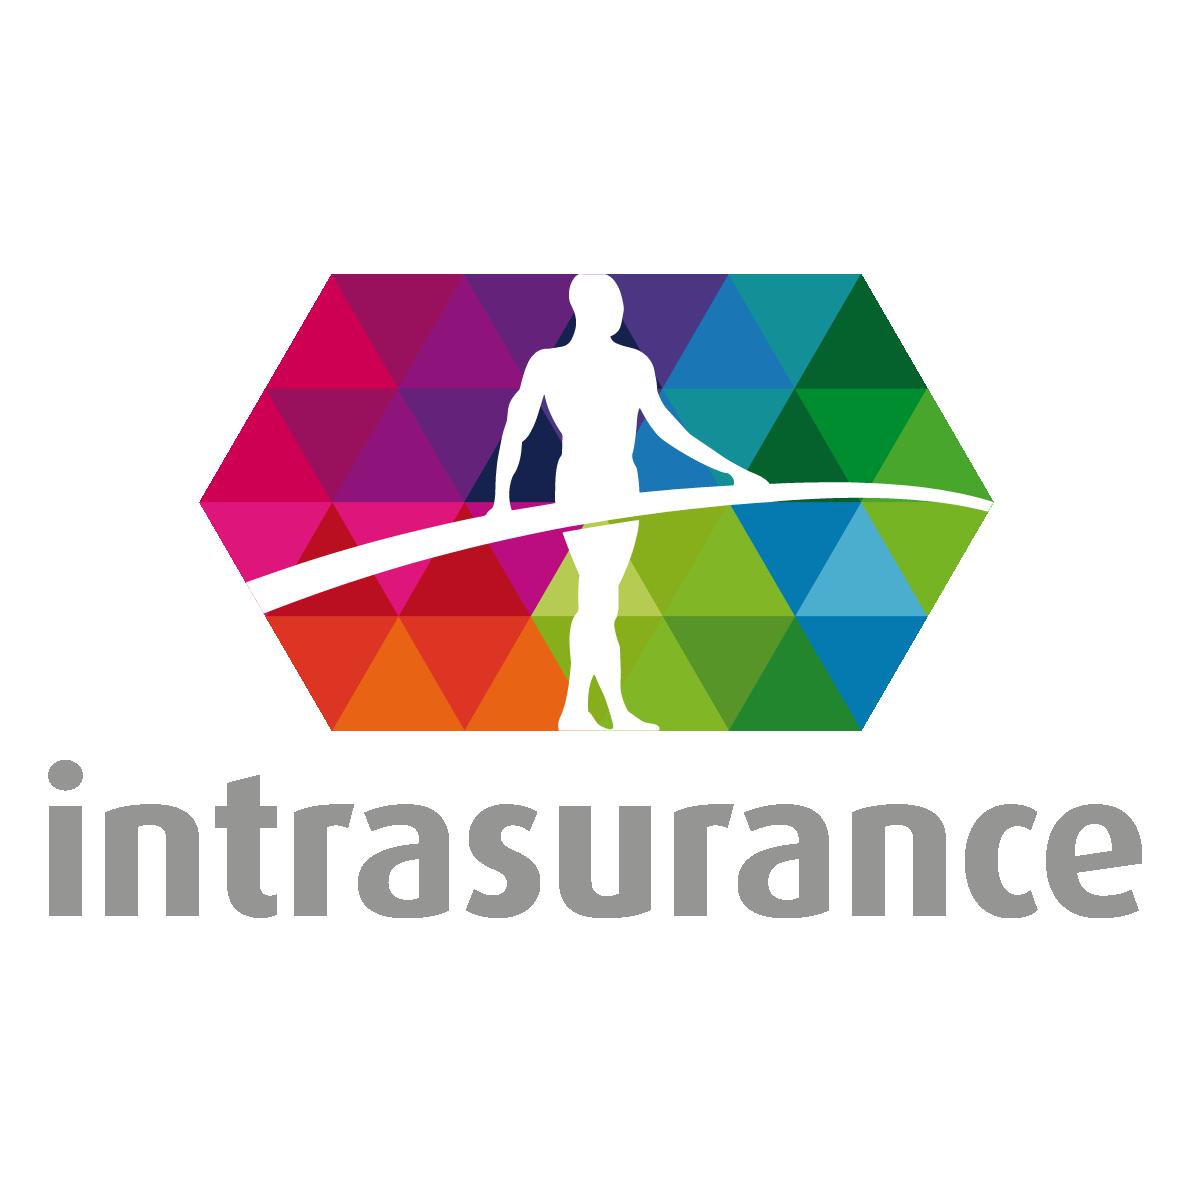 intrasurance